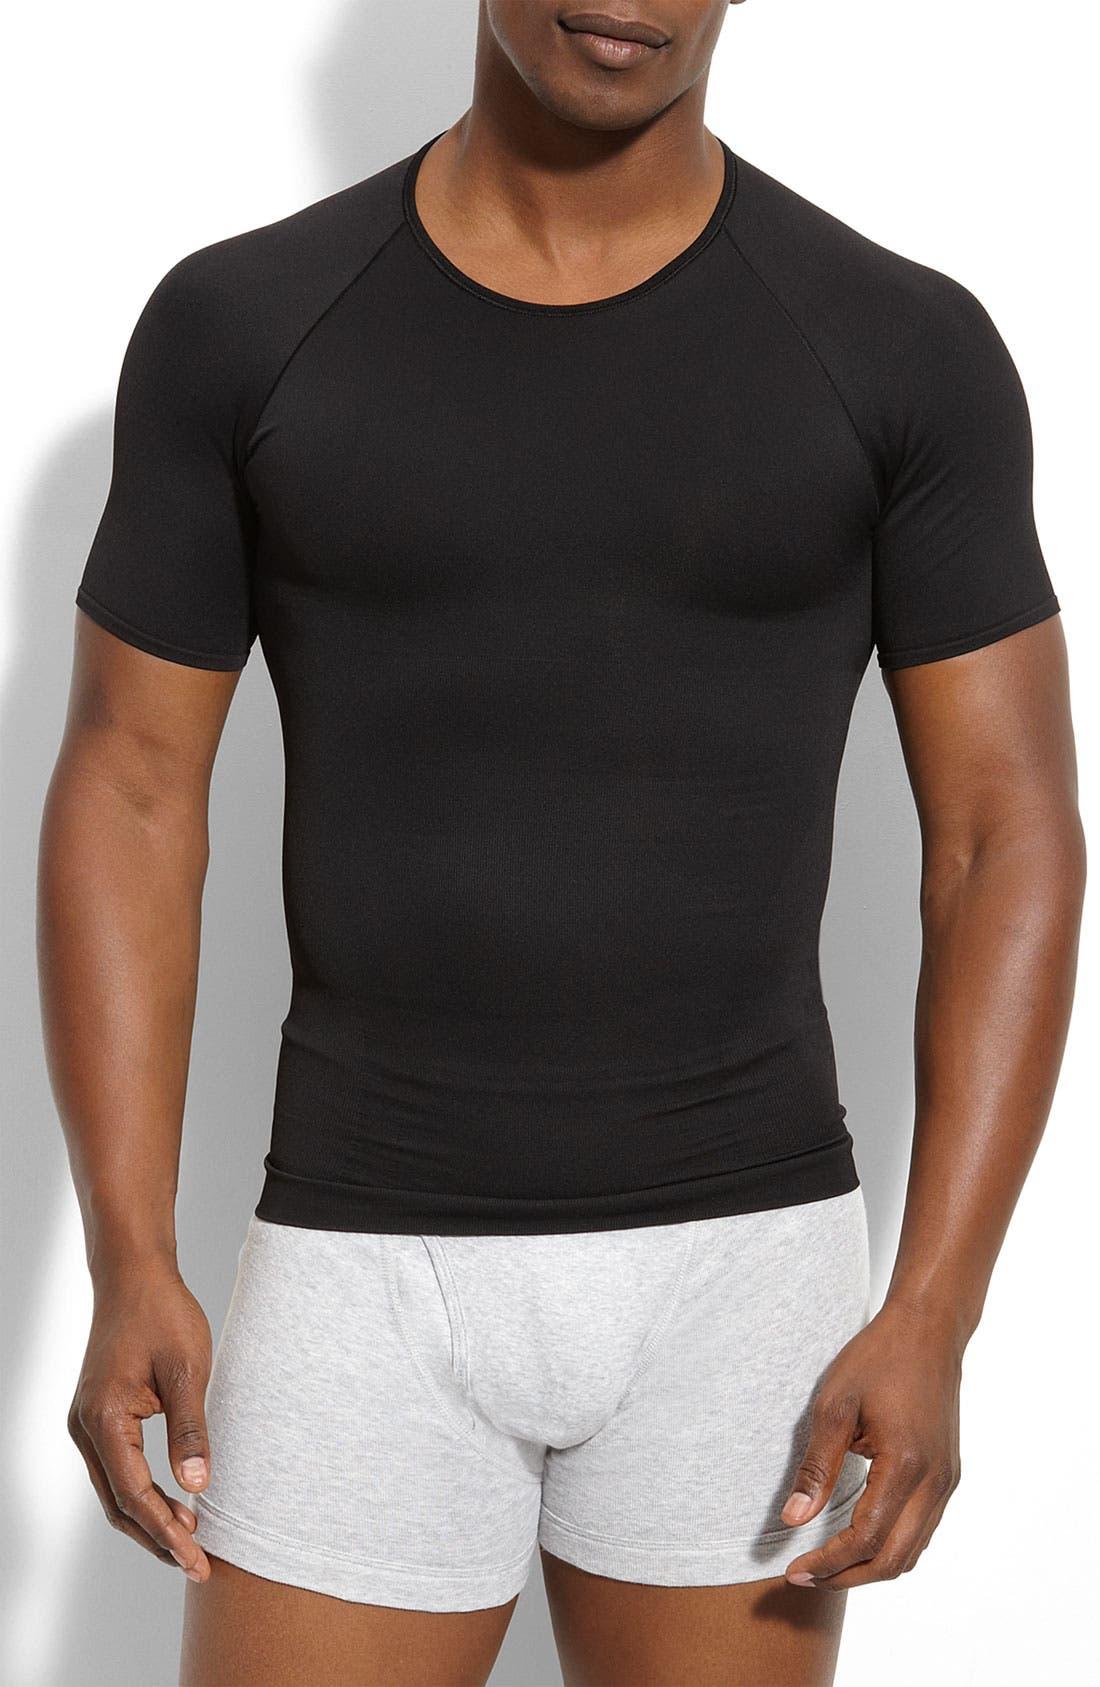 'Zoned Performance' Compression Crewneck T-Shirt, Main, color, BLACK